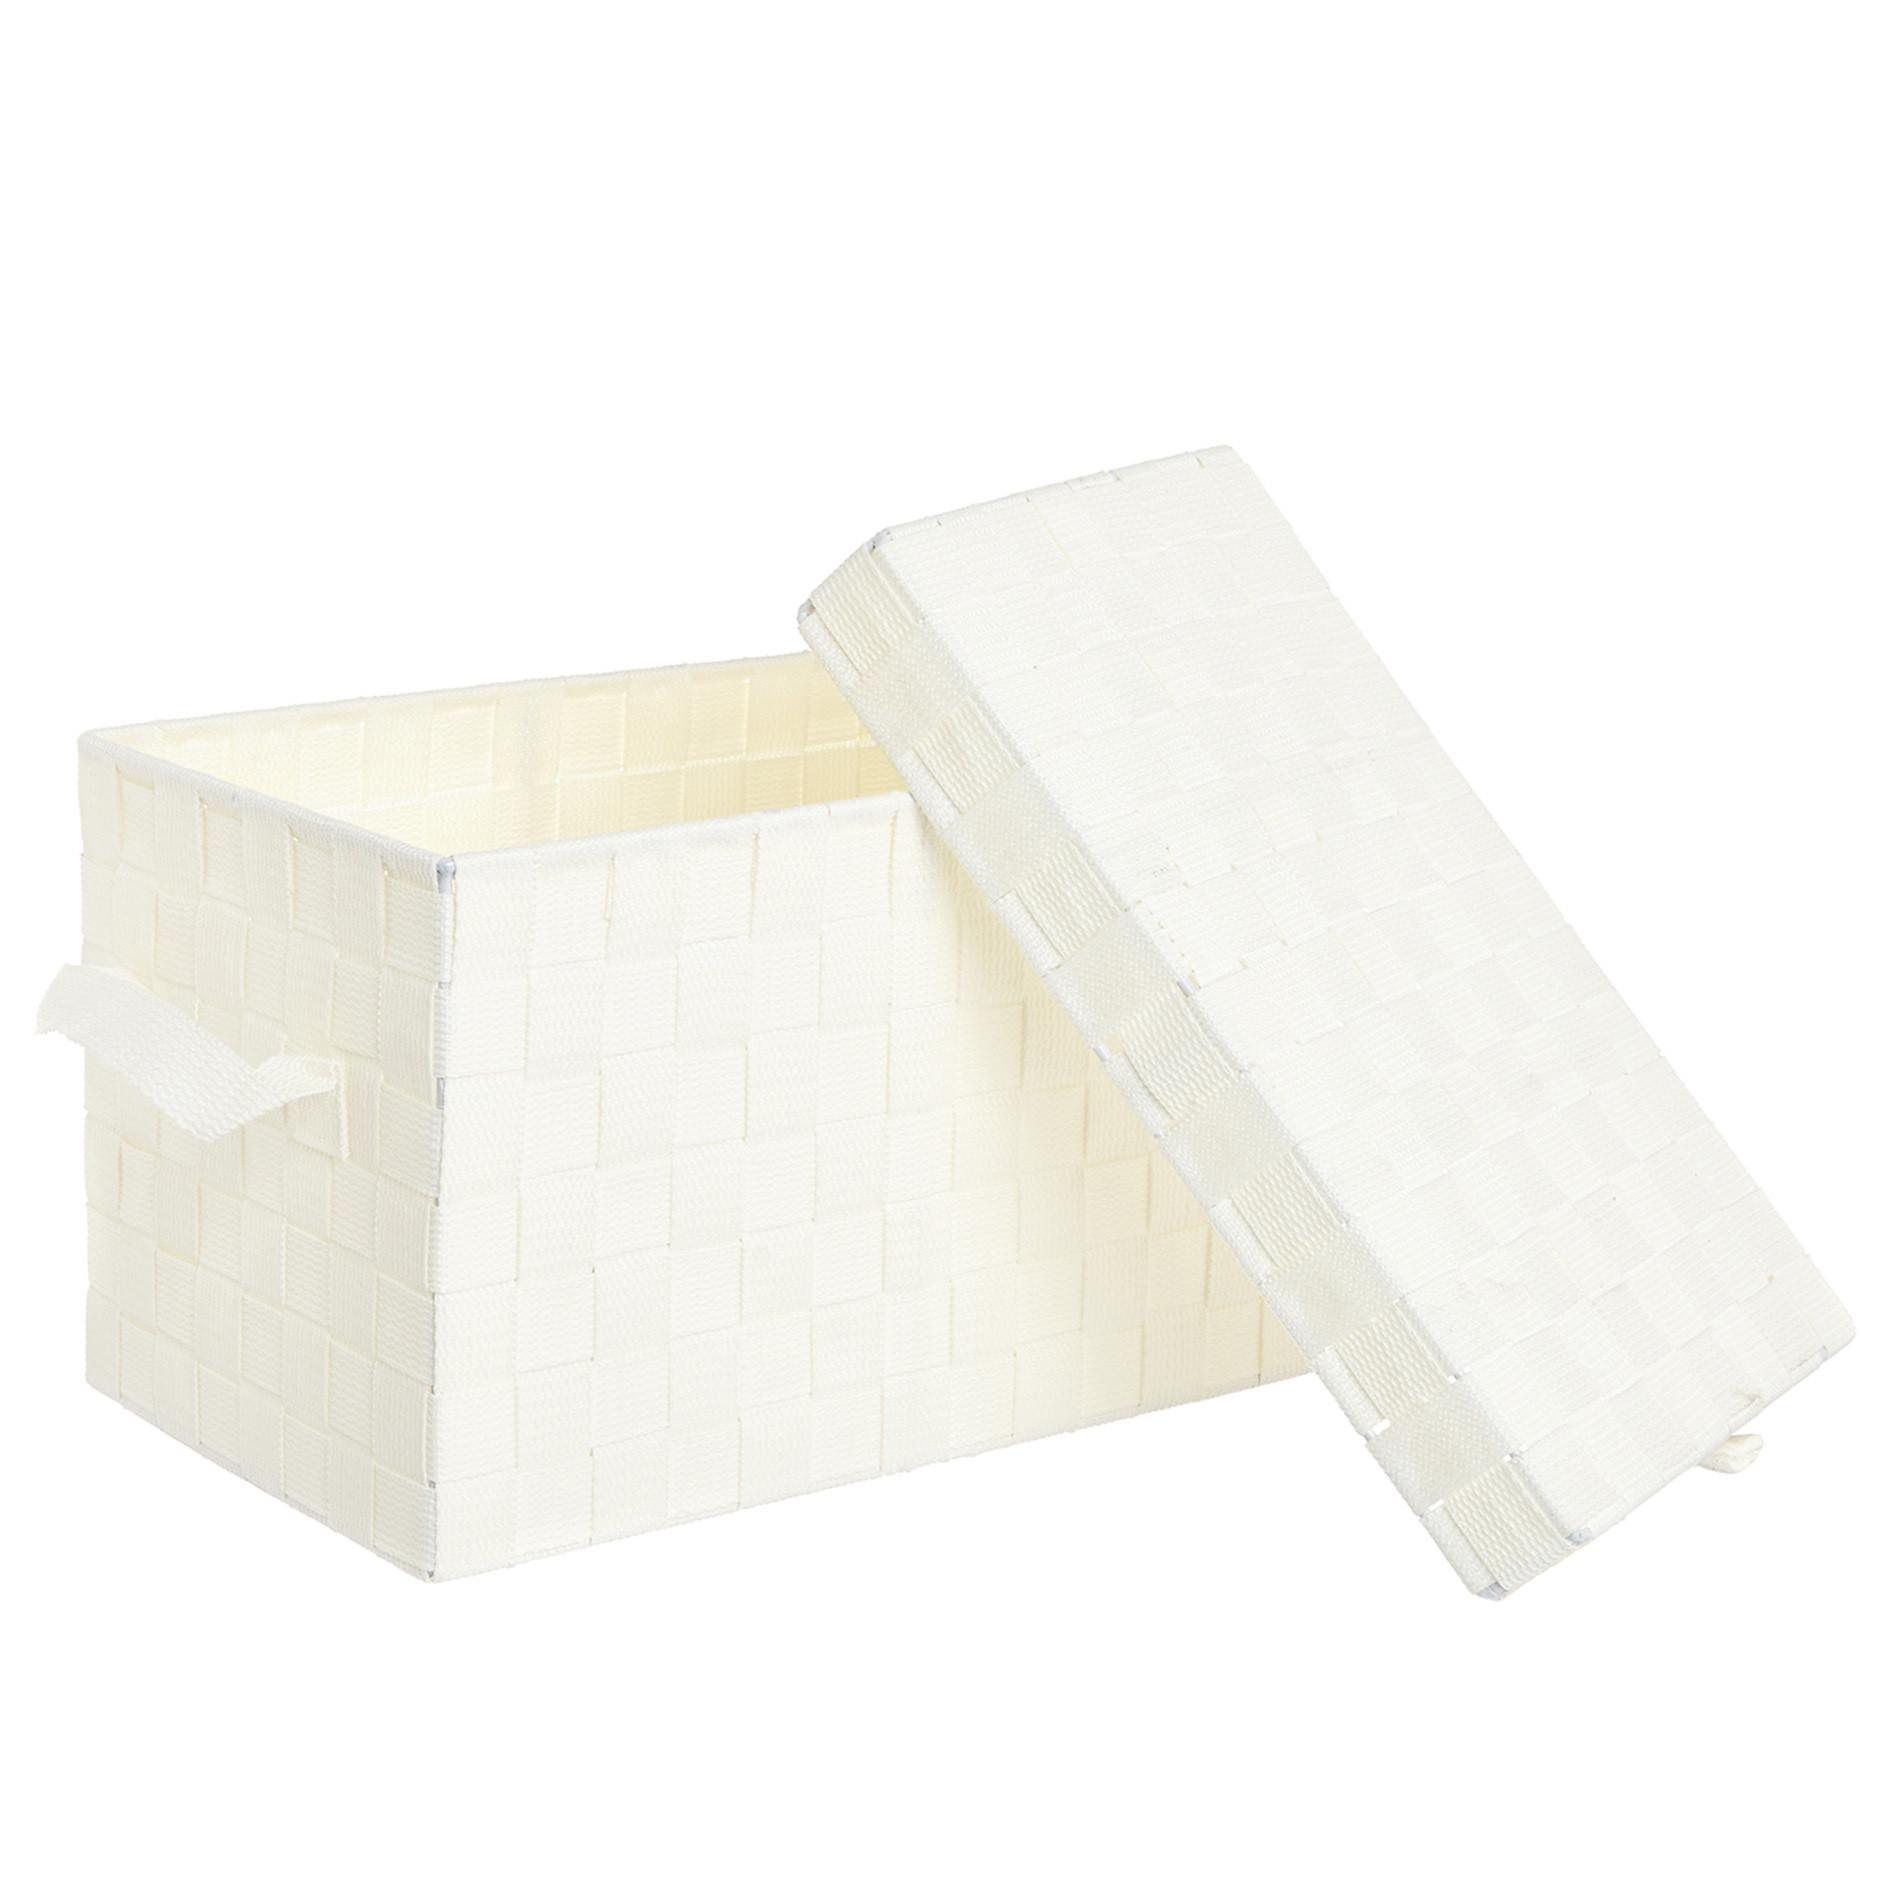 Storage box a nastri intrecciati, Bianco, large image number 1